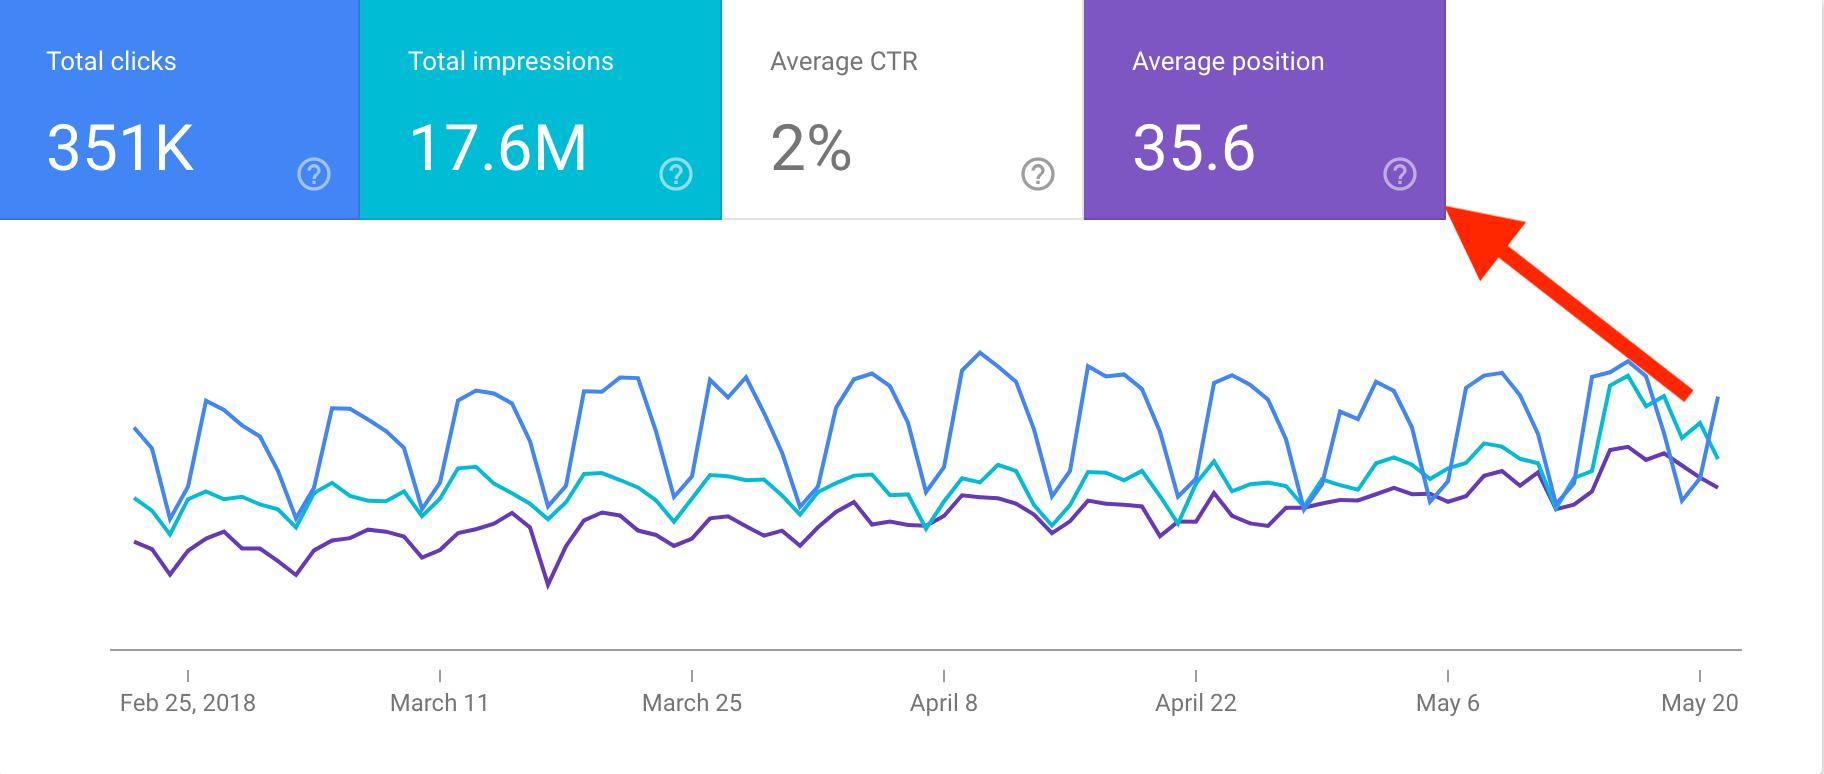 click average position